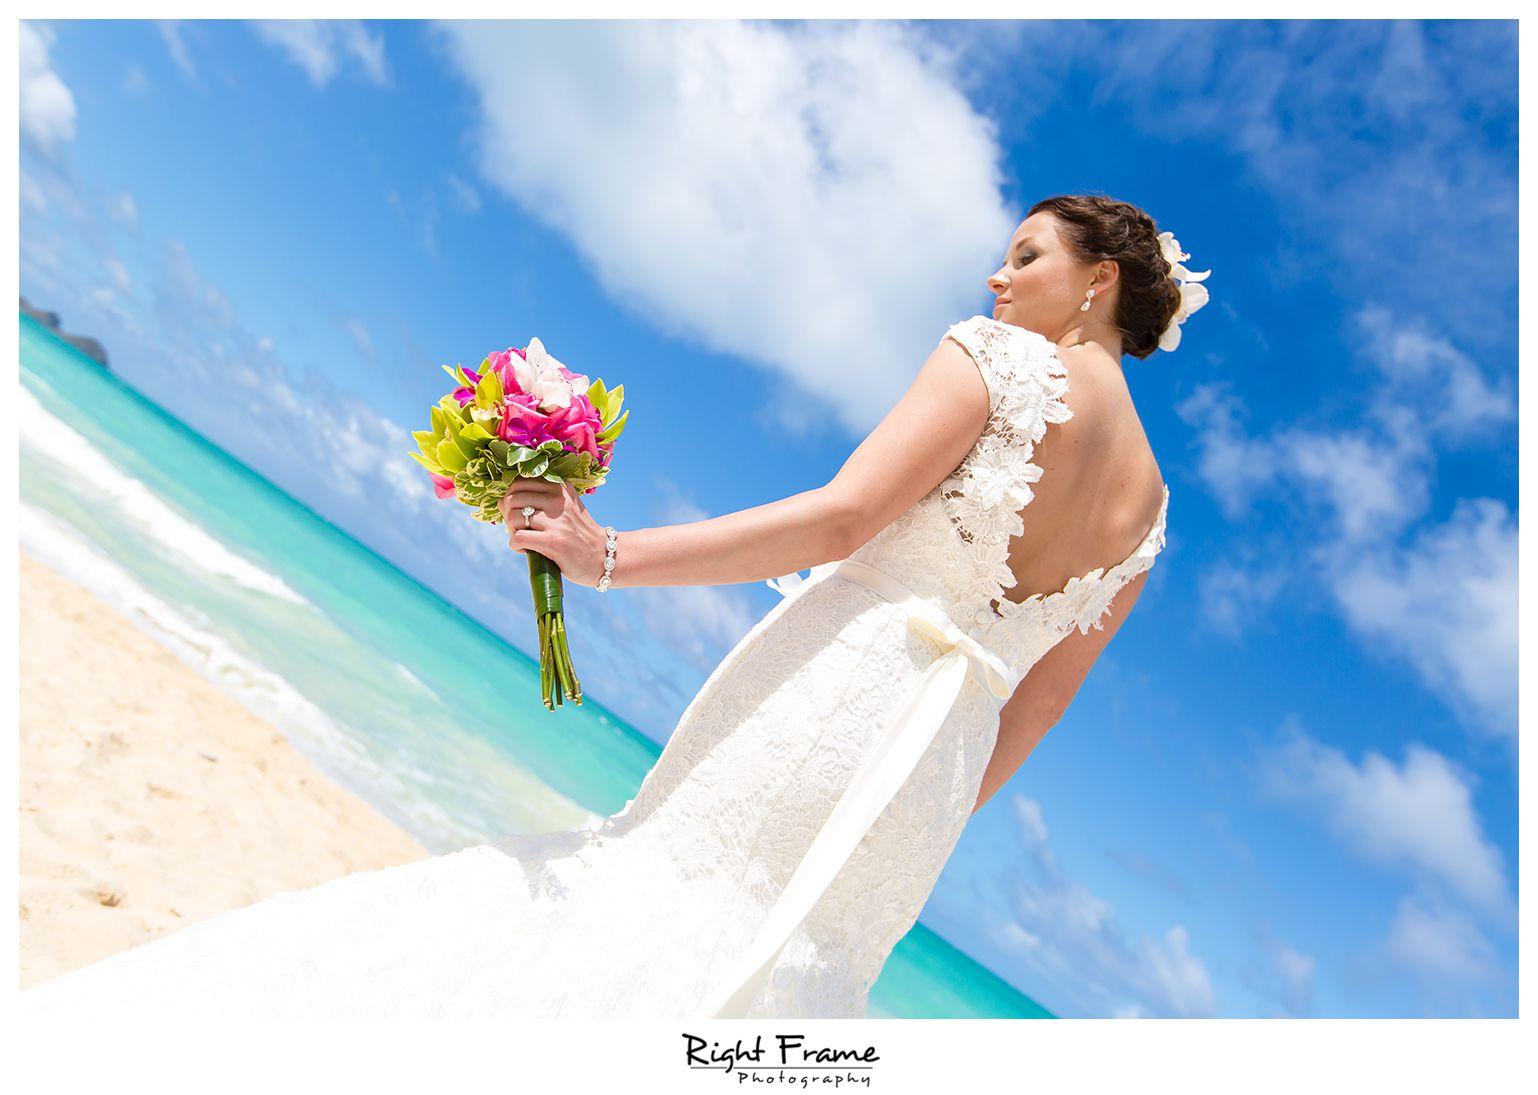 021_Oahu Beach Wedding waimanalo beach